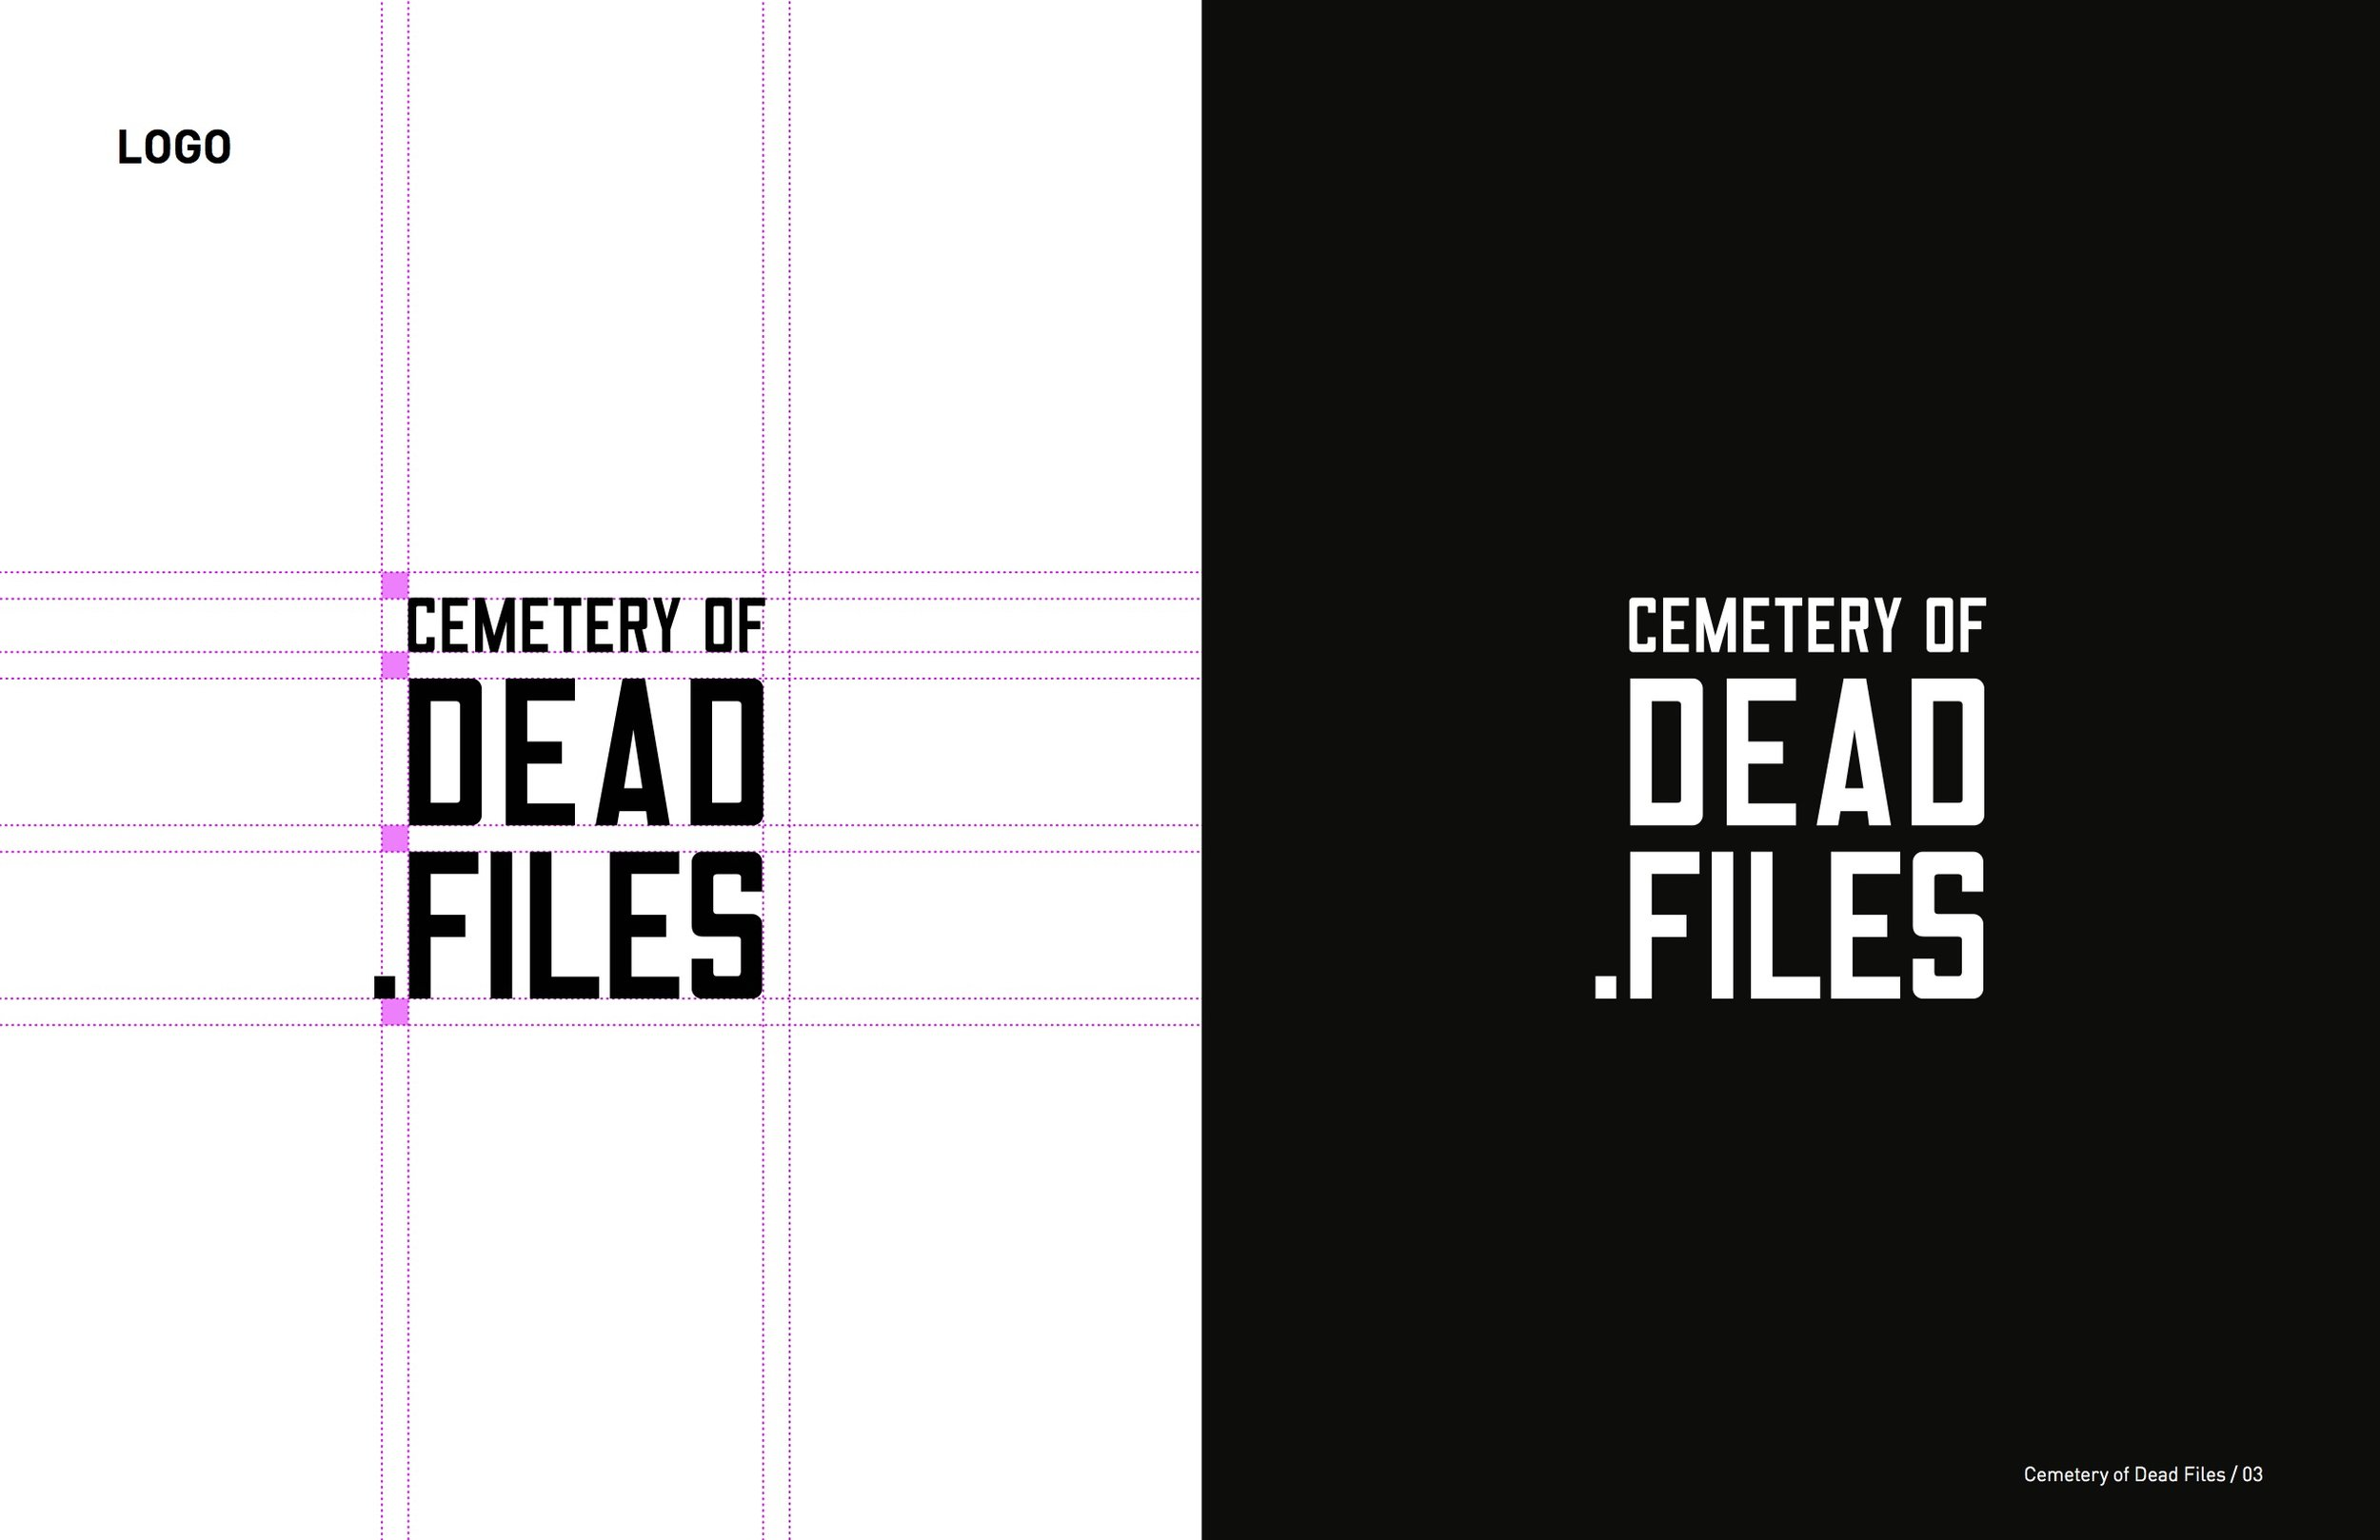 CemeteryofDeadFiles_AngelaKim.jpg